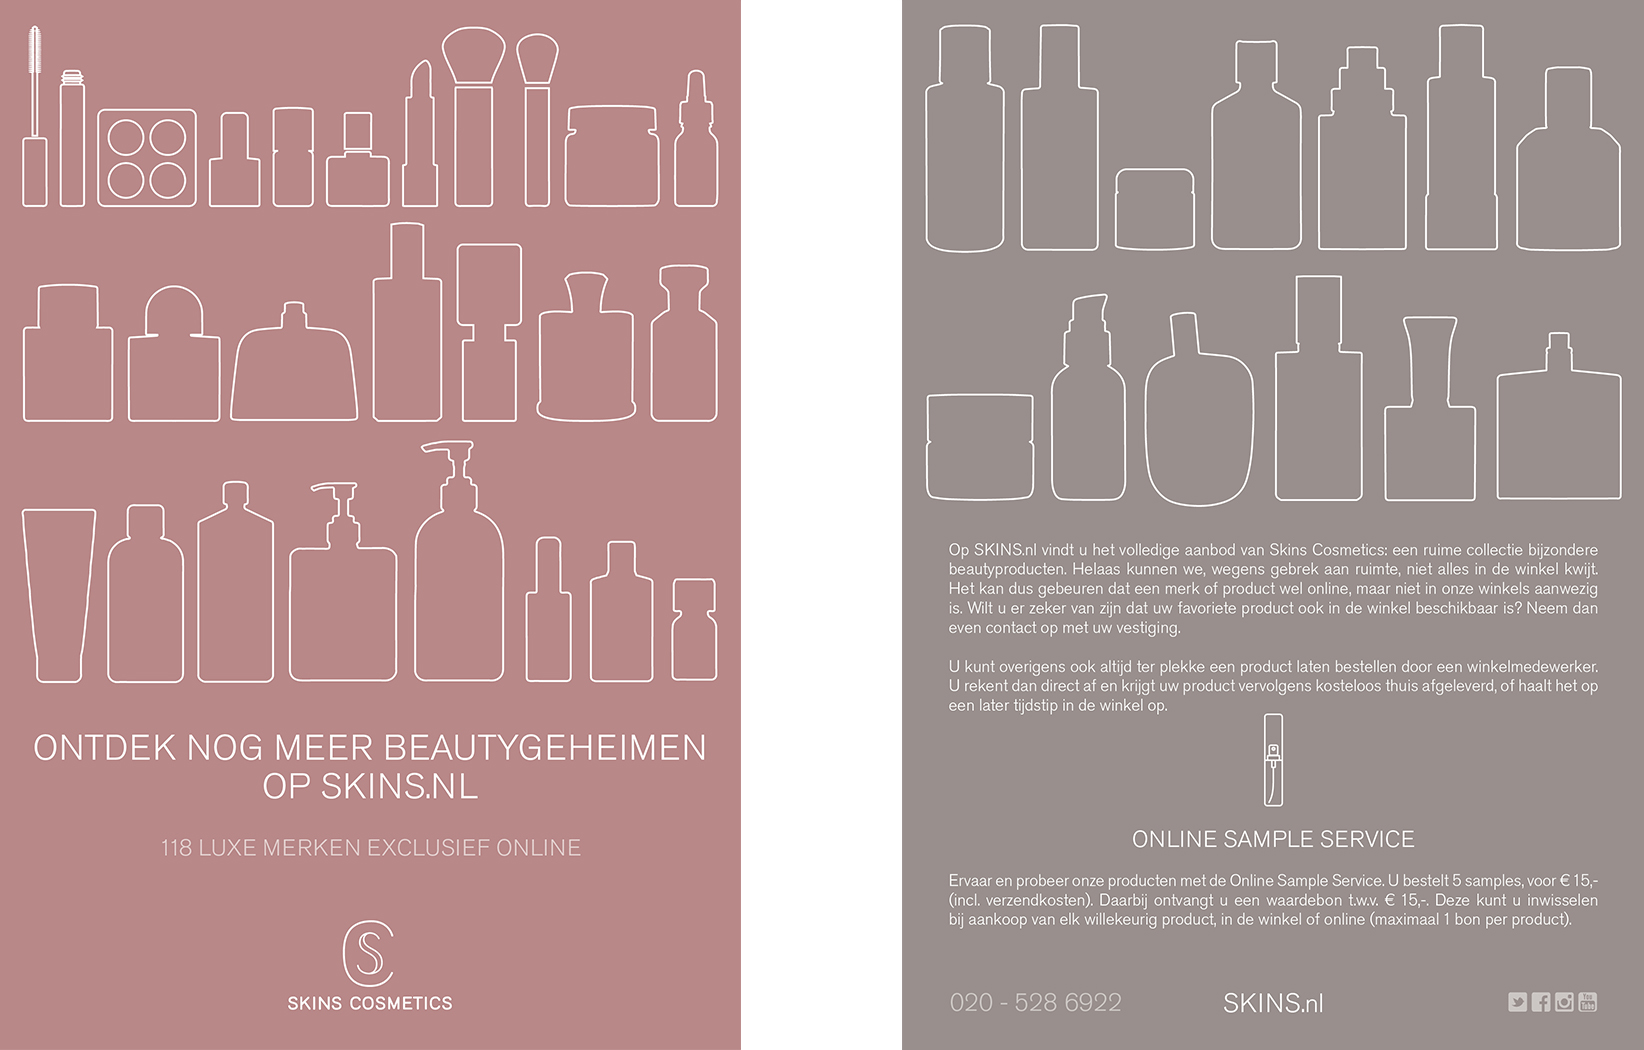 Skins Cosmetics Webshop flyer